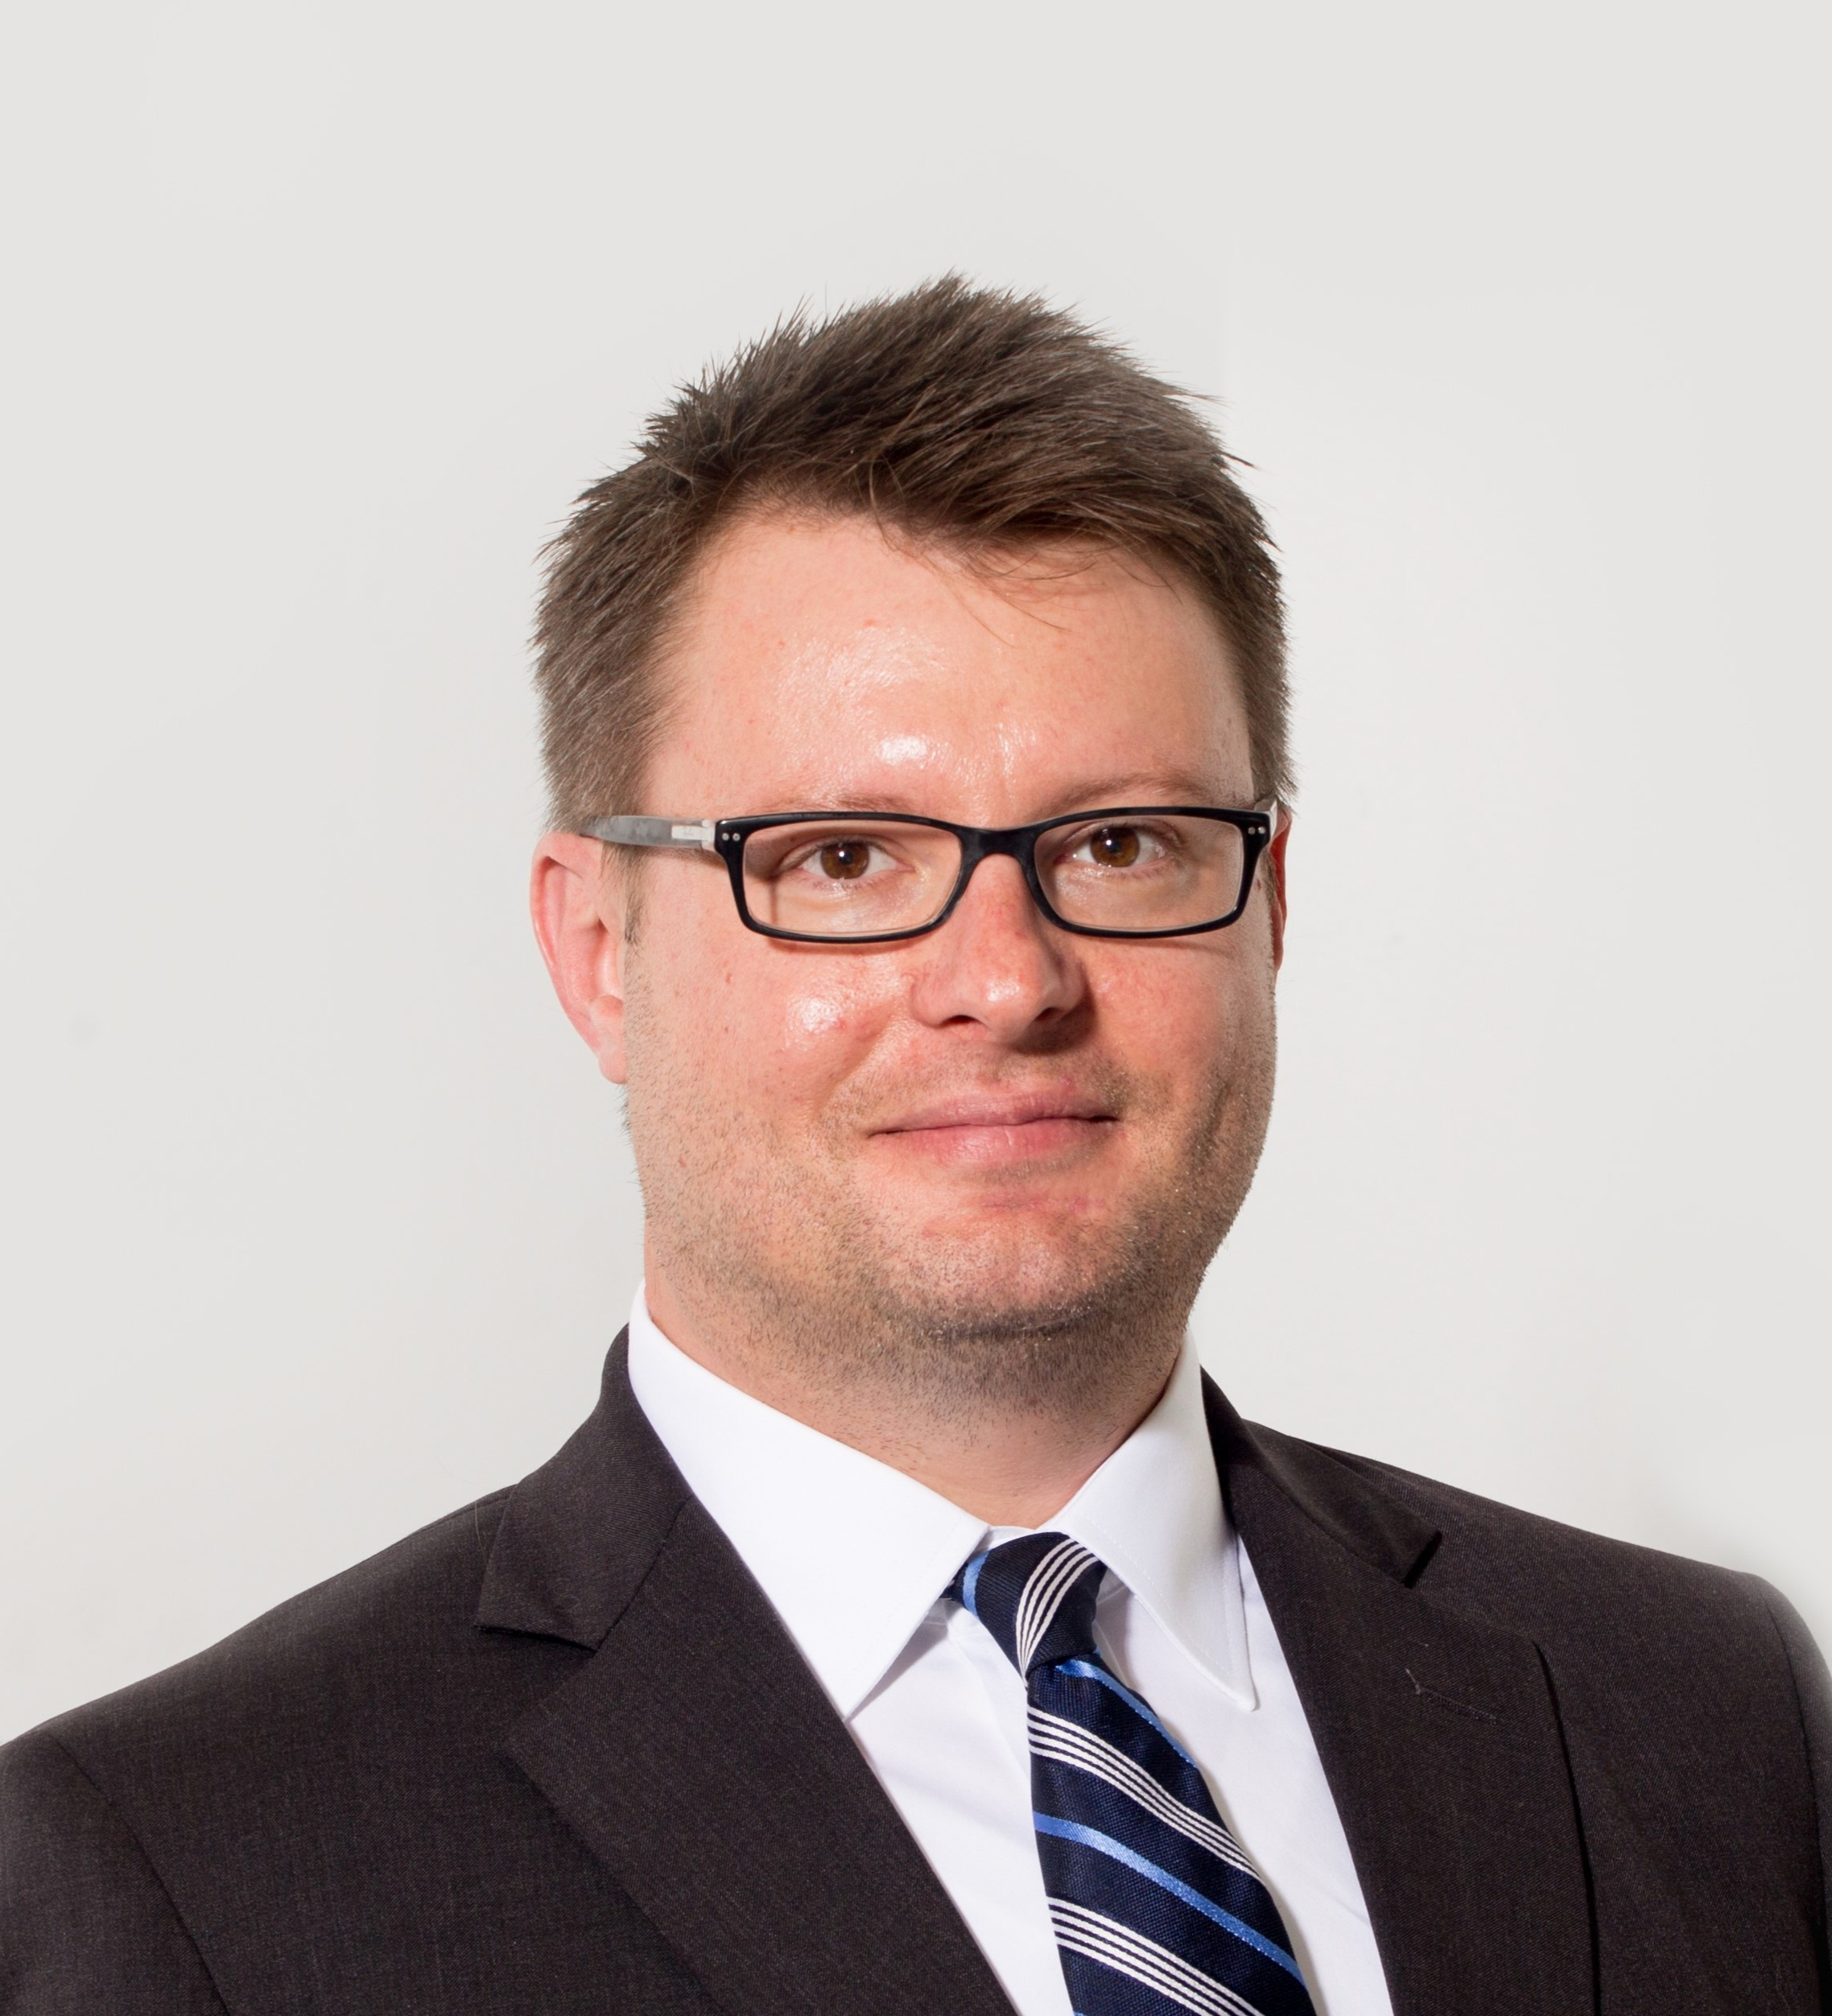 Bret Hembd's Profile Image